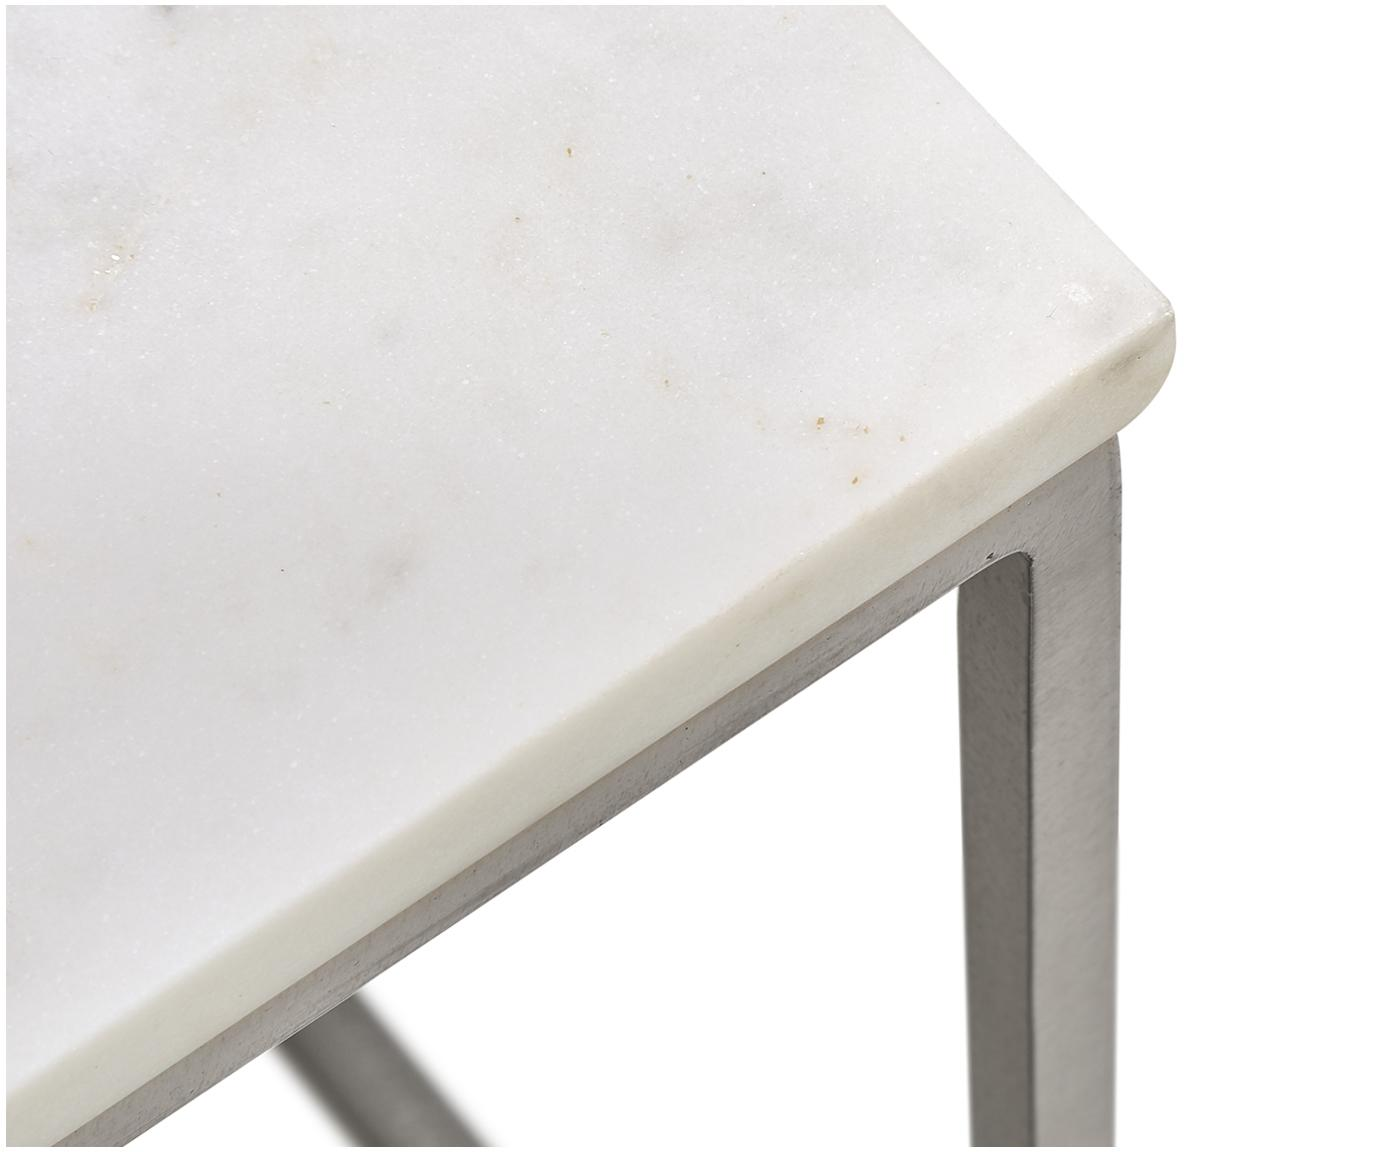 Marmeren salontafel Alys, Tafelblad: marmer, Frame: gepoedercoat metaal, Tafelblad: wit marmer. Frame: zilverkleurig, glanzend, 80 x 45 cm